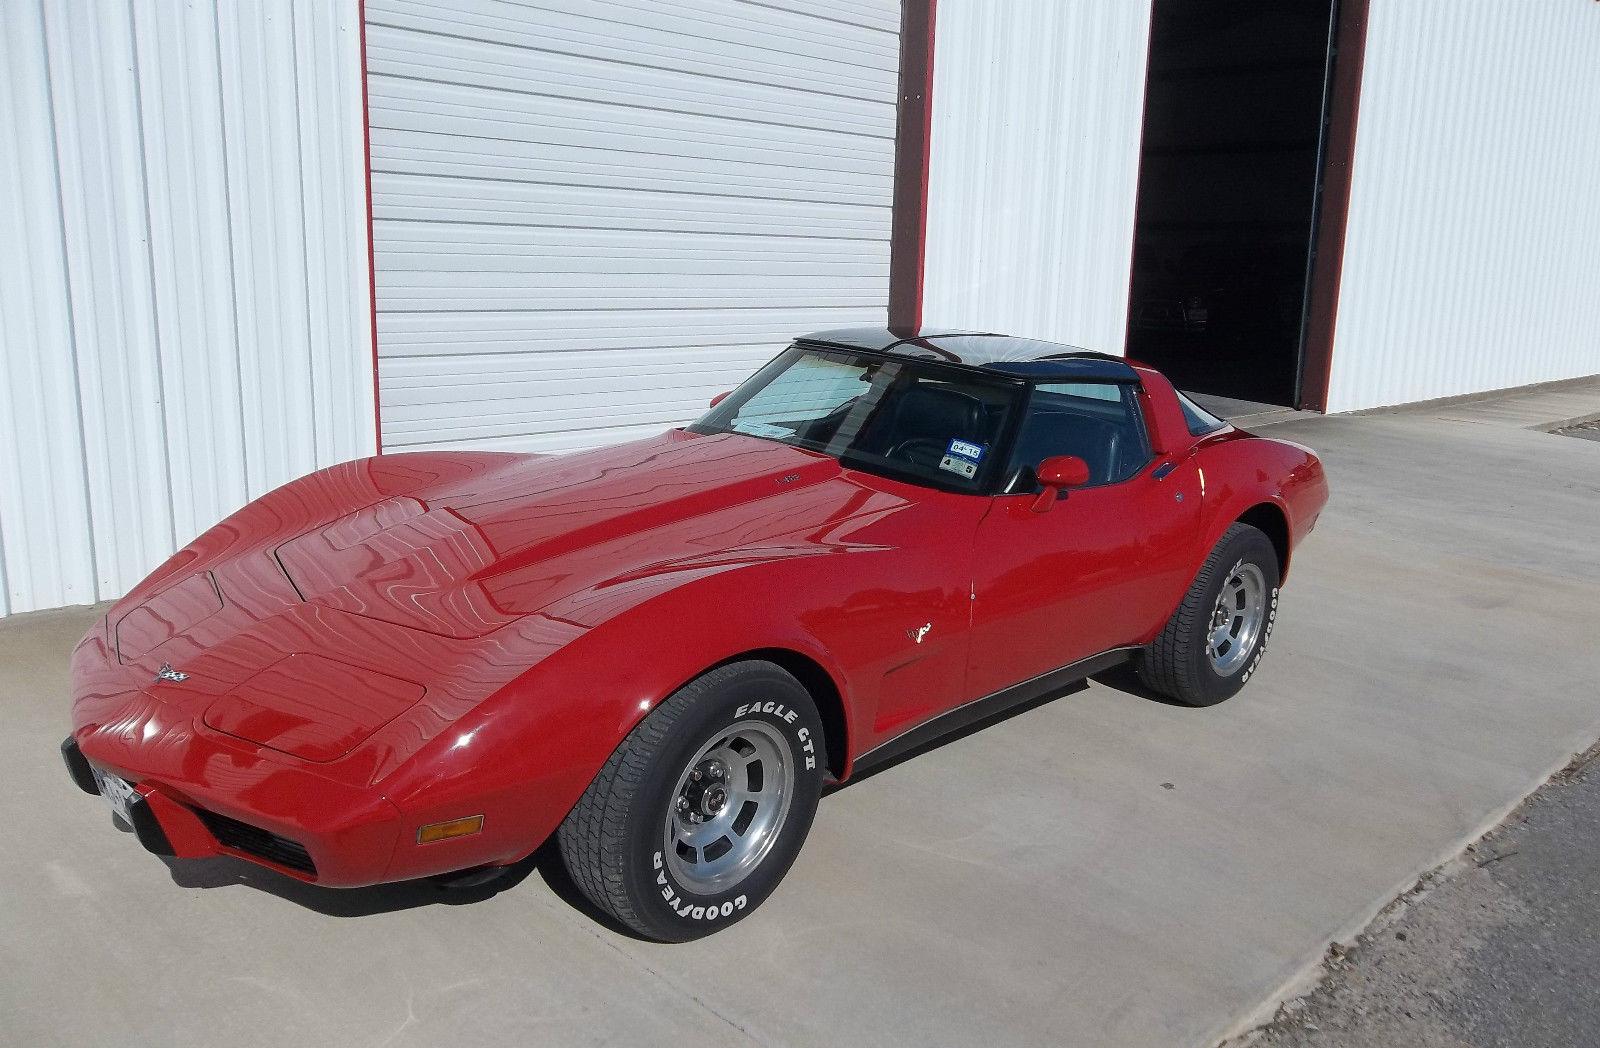 1979 Chevrolet Corvette L82 Red with Black interior T